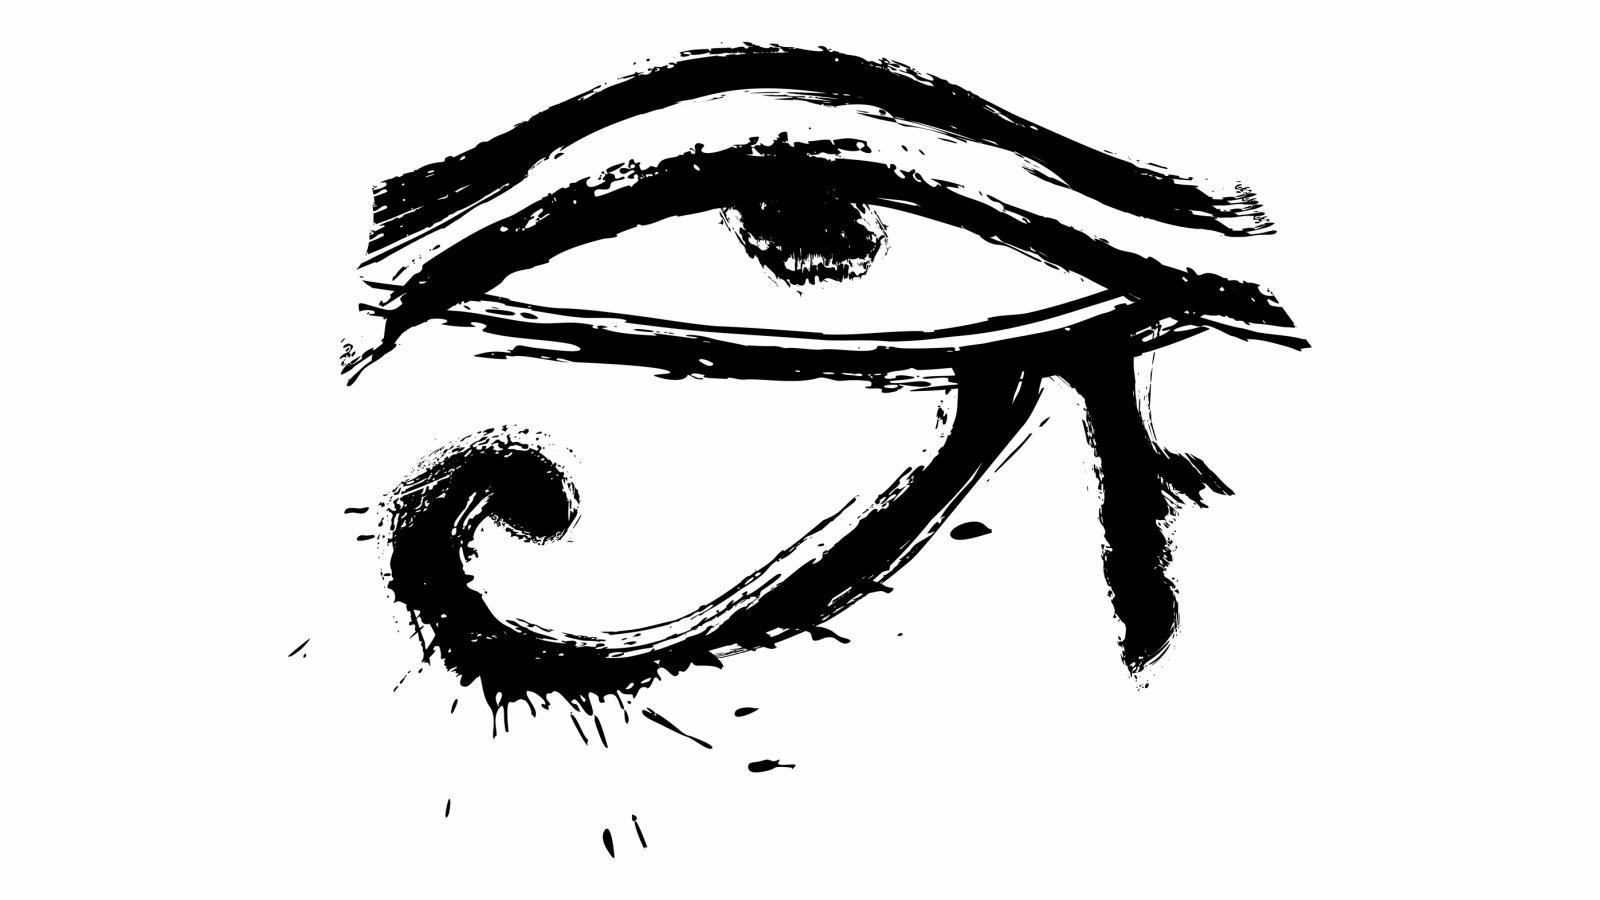 Eye Of Horus wallpapers HD for desktop backgrounds